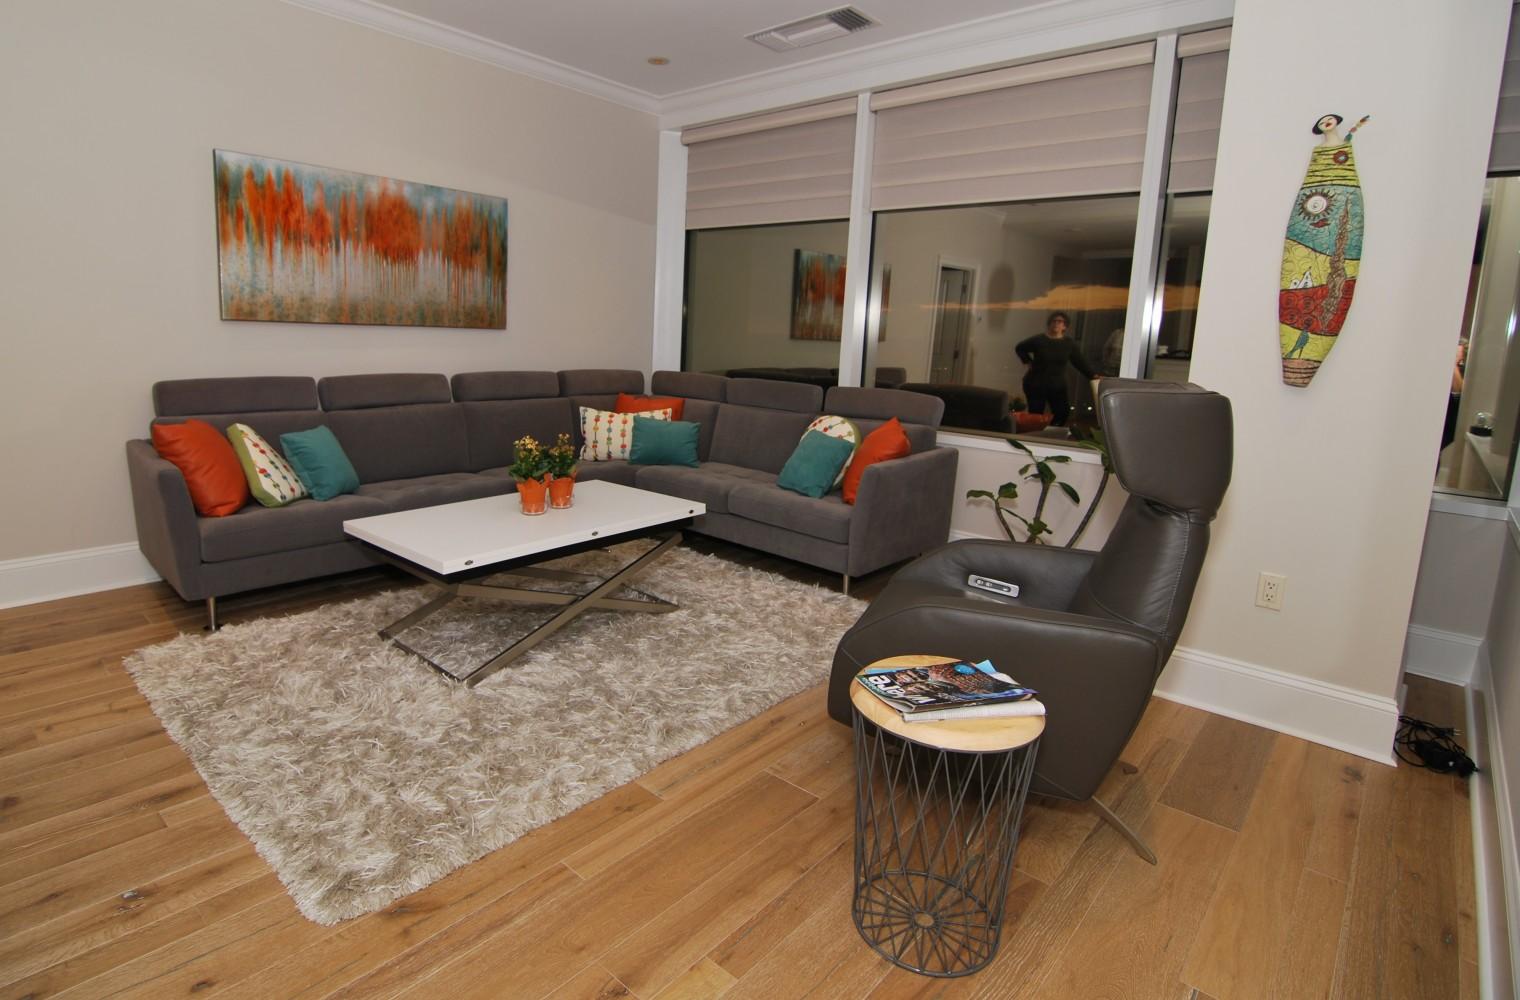 BoConcept Osaka Sofa Harvard Chair | Philadelphia PA | Distinctive Interior Designs LLC